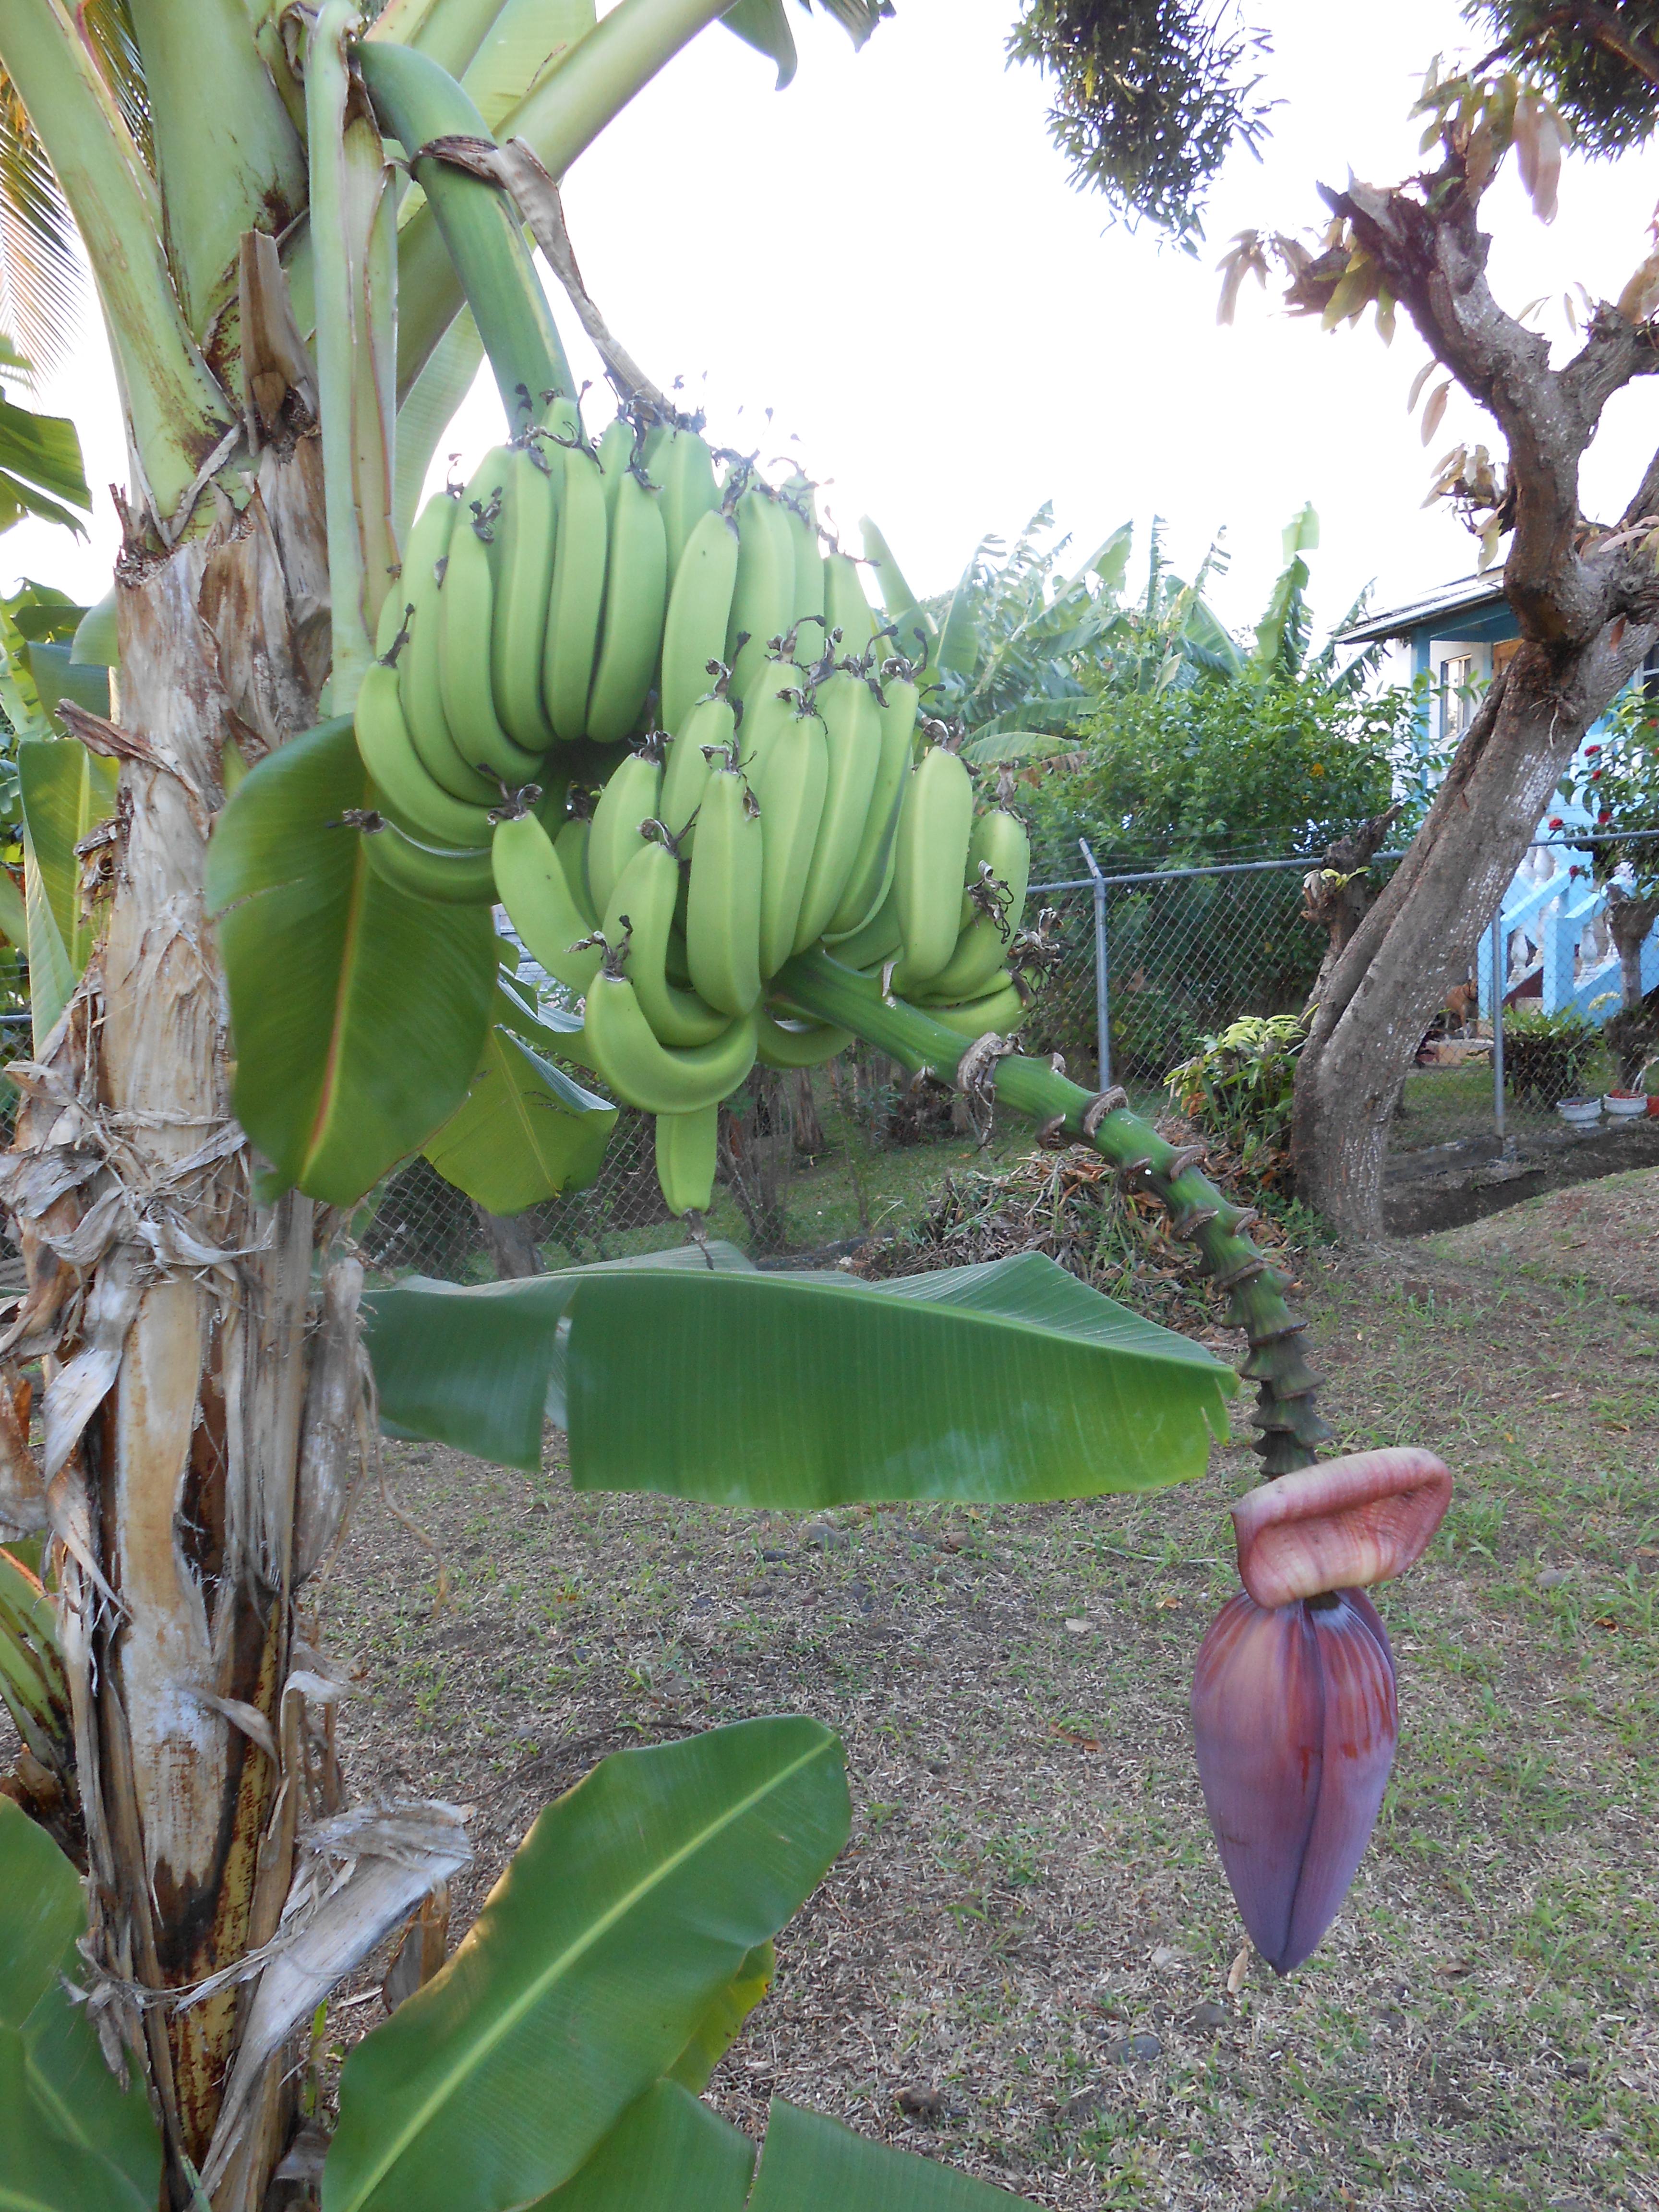 Grenada Food Report: Part III | Tan Rosie Caribbean Food Blog